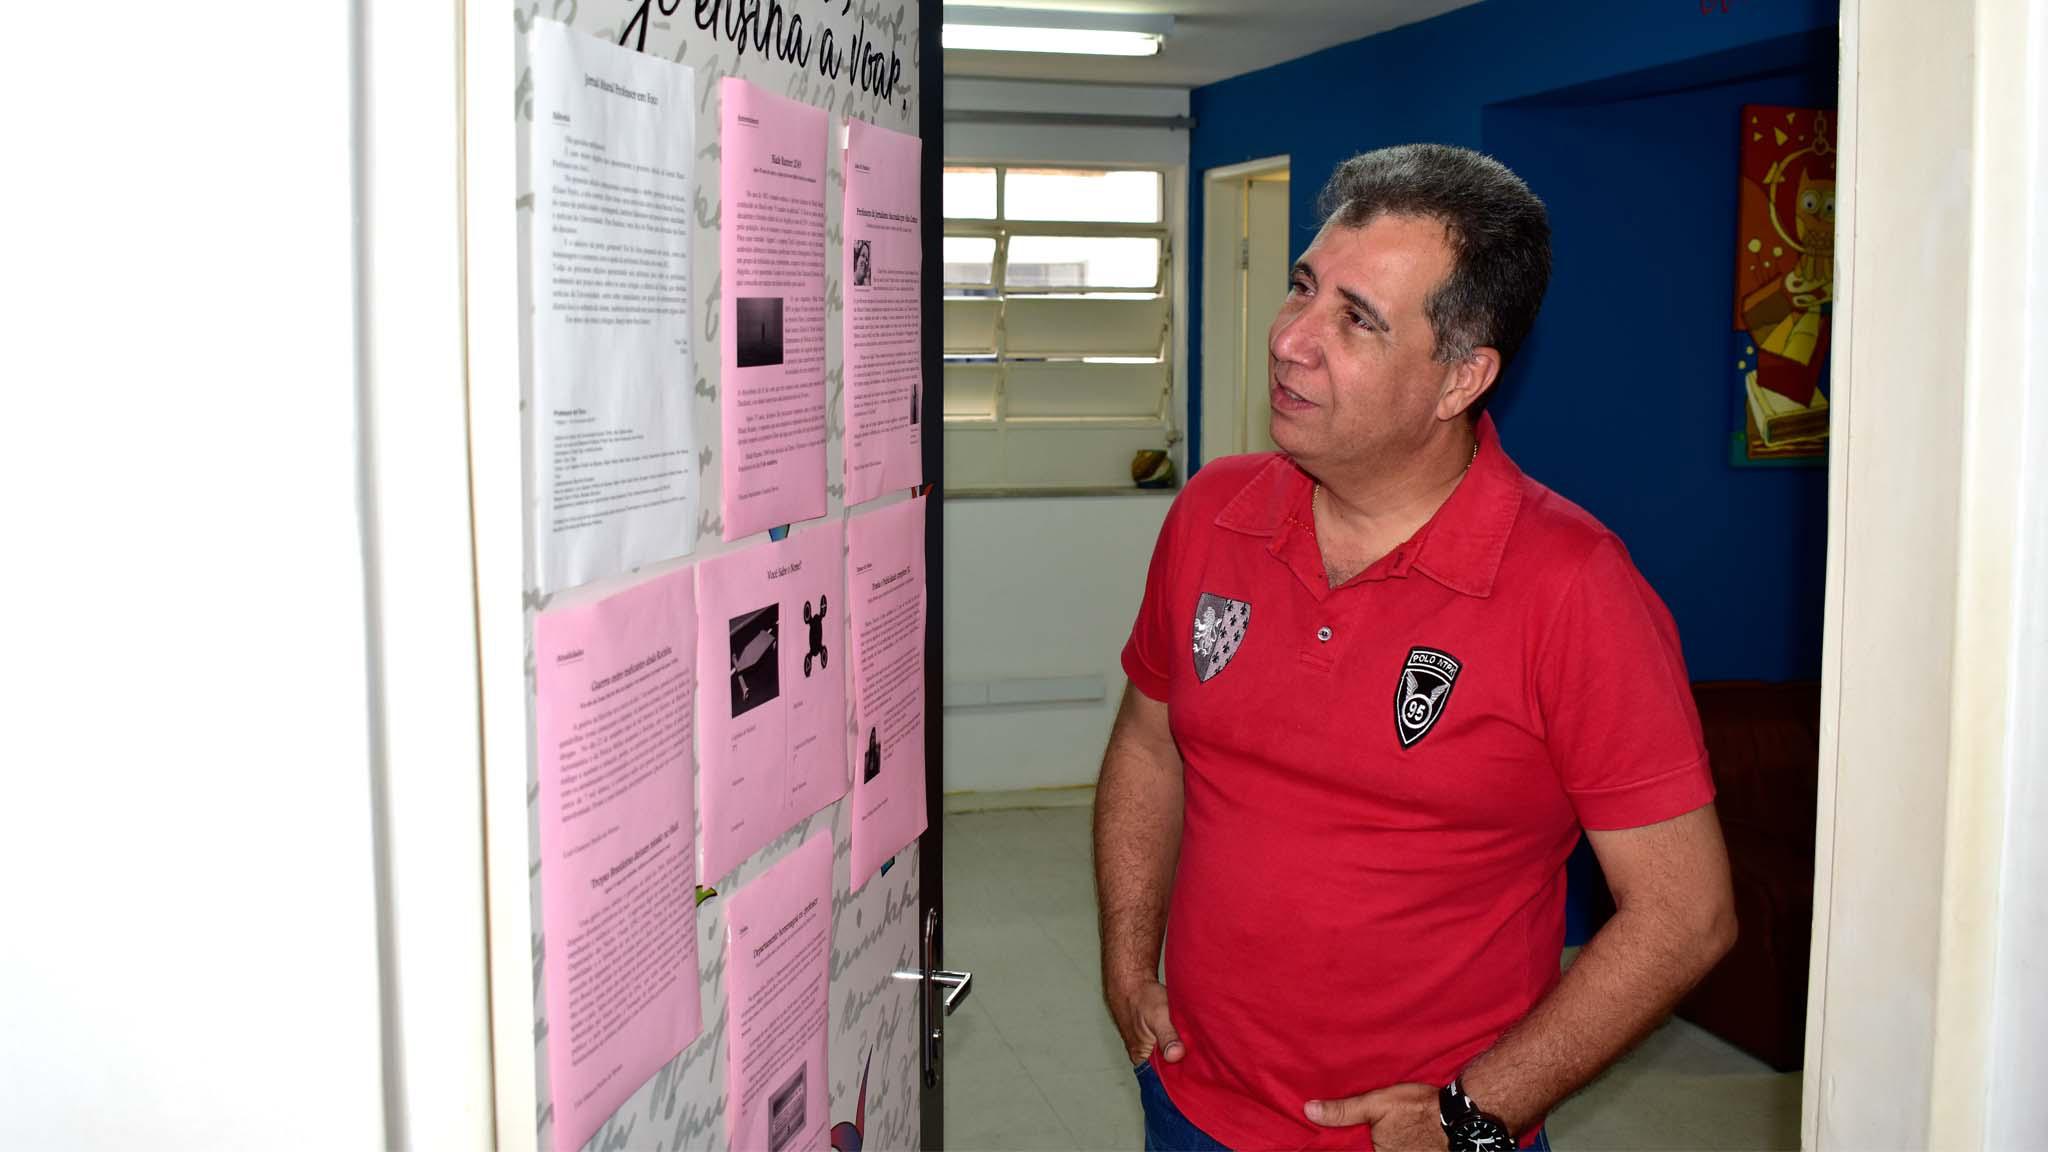 Departamento recebe Jornal interno de acadêmicos